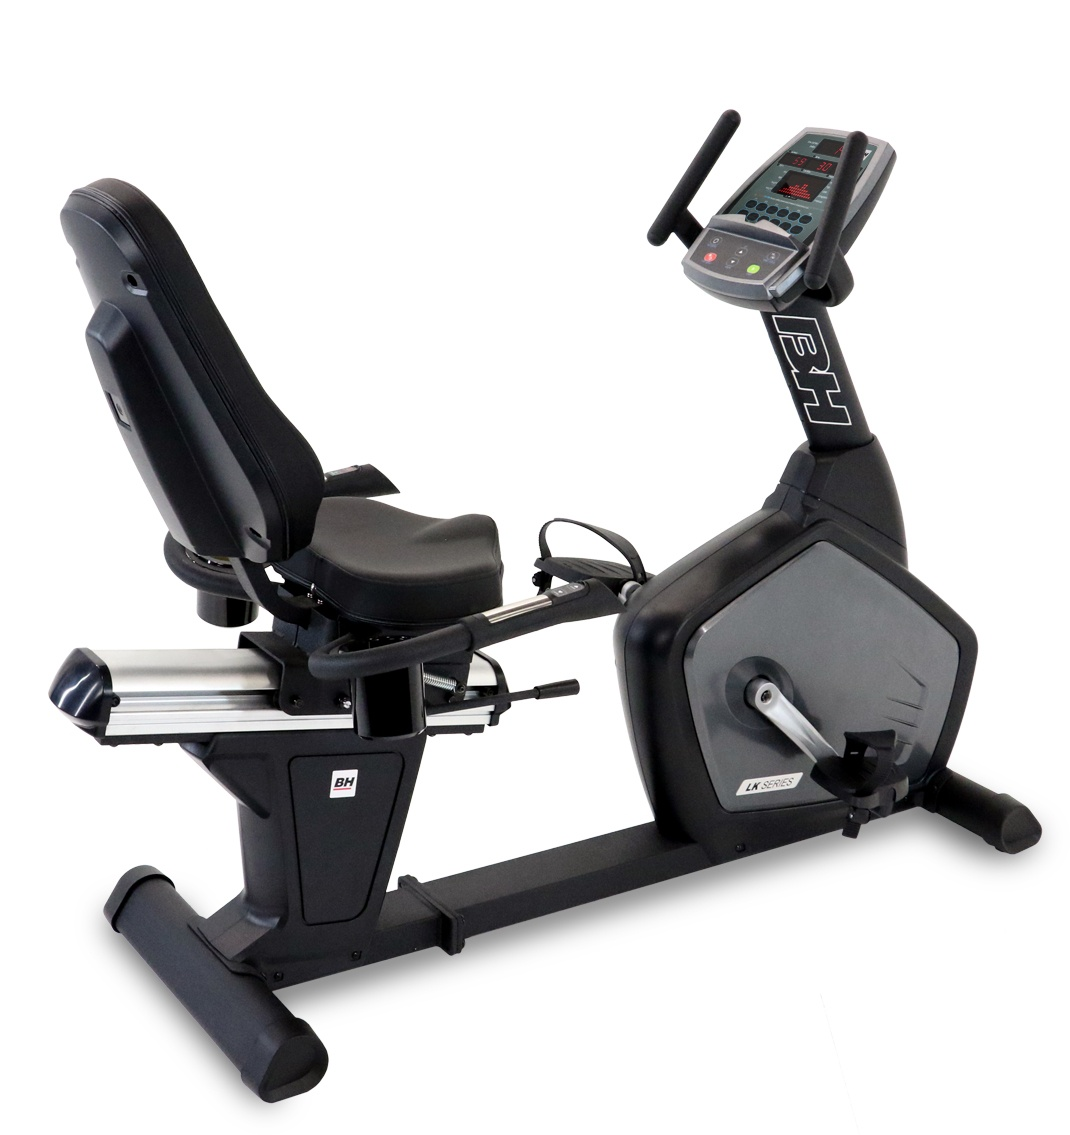 Lk700r Recumbent Cycles New Gym Pros